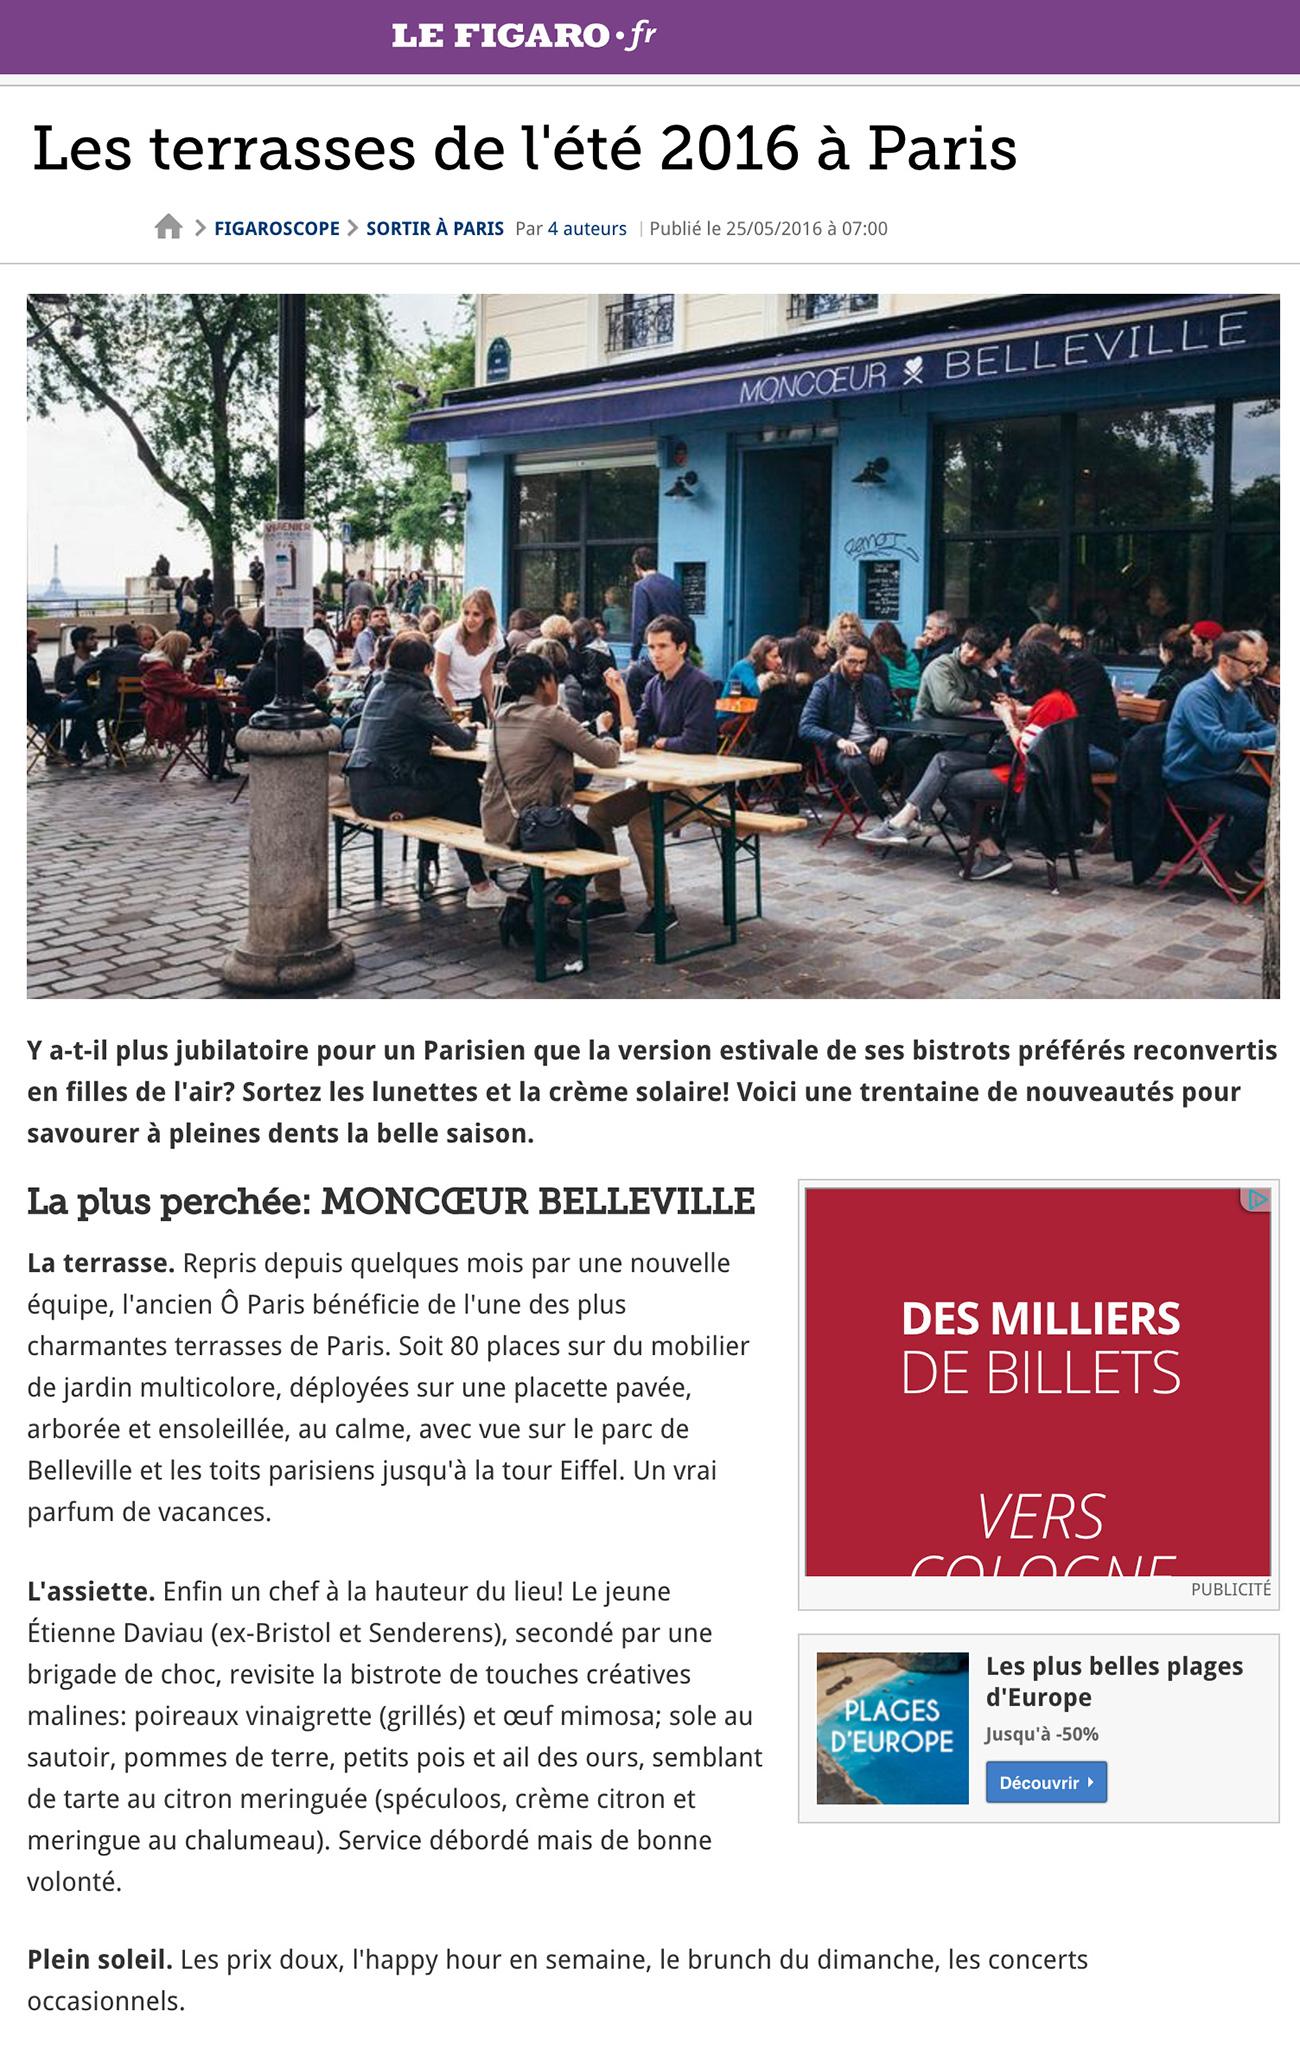 moncoeur-belleville-terrasses-figaroscope